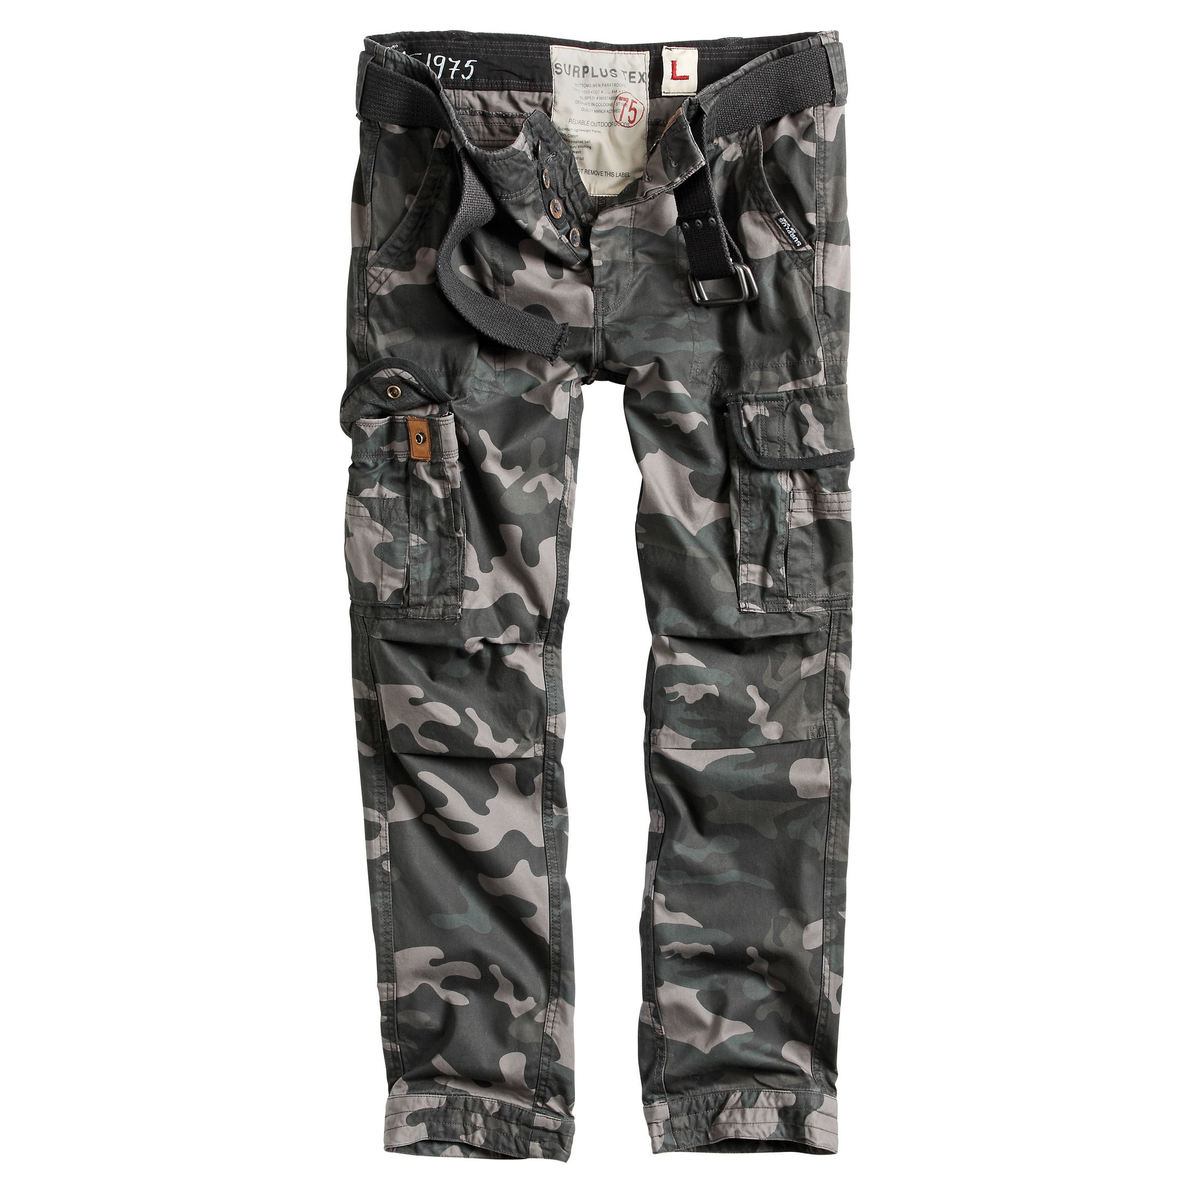 SURPLUS férfi nadrág - PREMIUM SLIMMY - FEKETE CAMO - 05-3602-42 -  Metalshop.hu 7252241acd